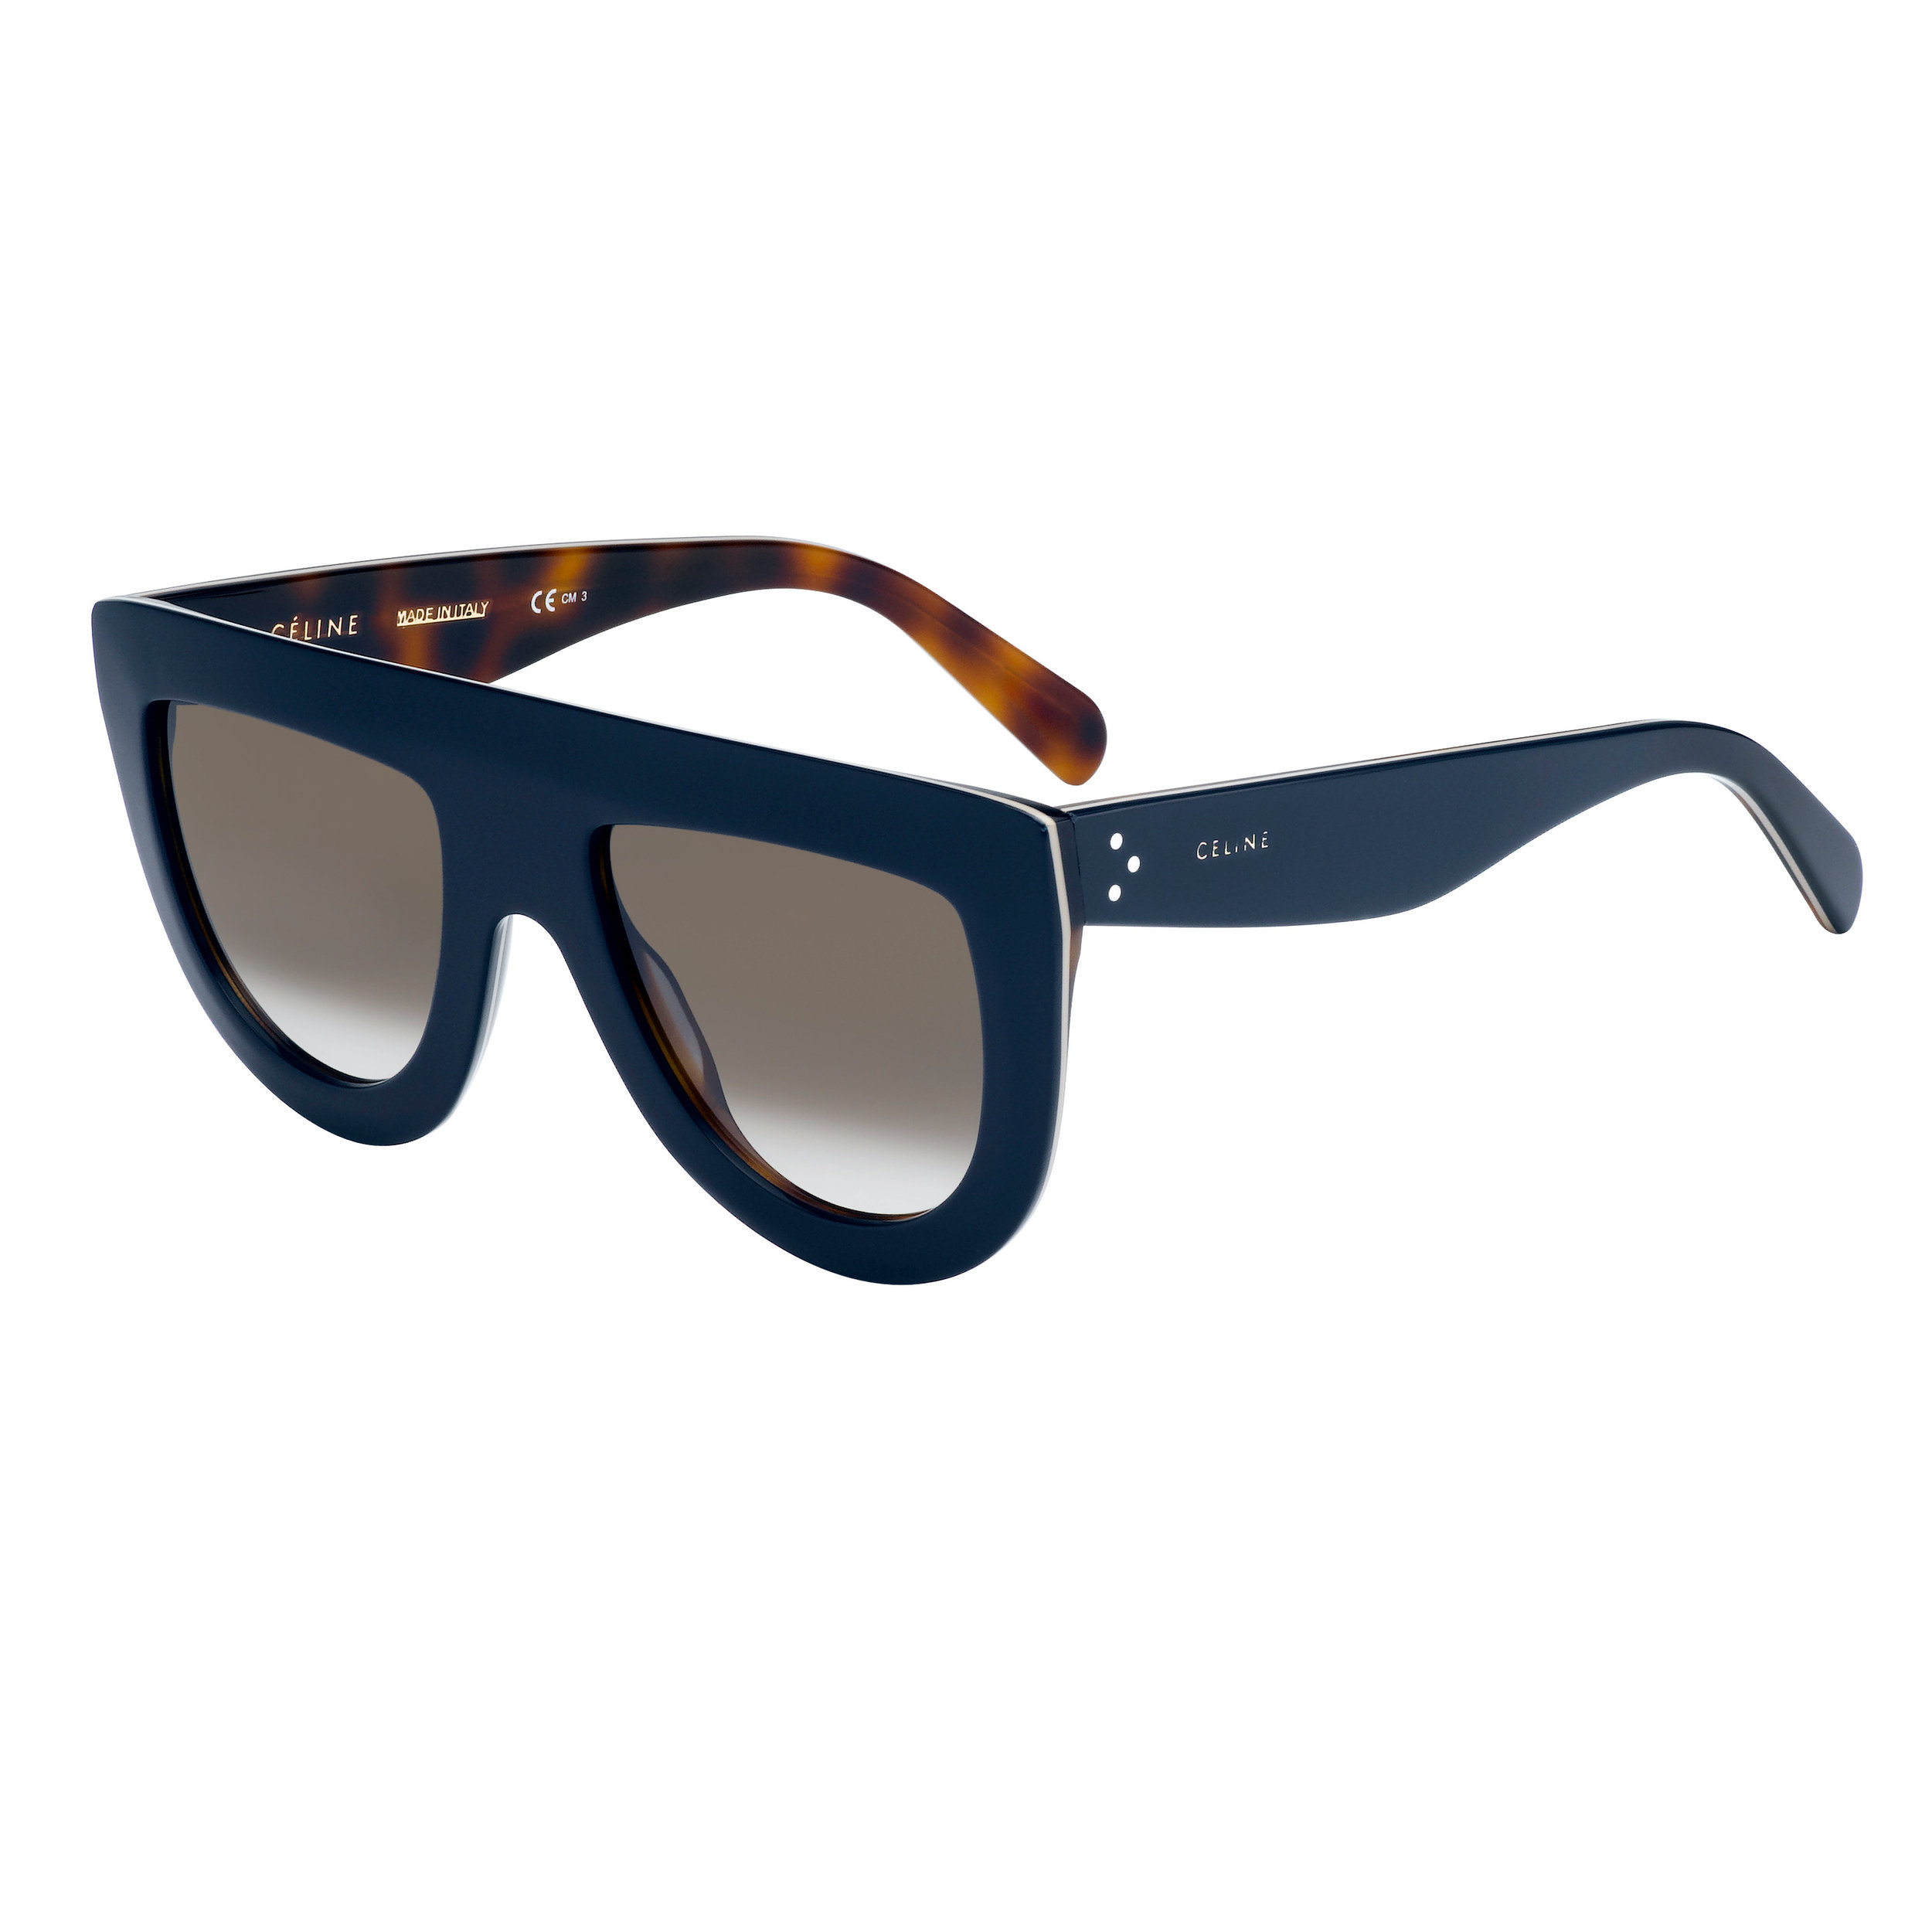 fc6a03c938 Celine Andrea Oversized Flat Top Sunglasses in Navy. cl41398s 273z3 (1).jpg